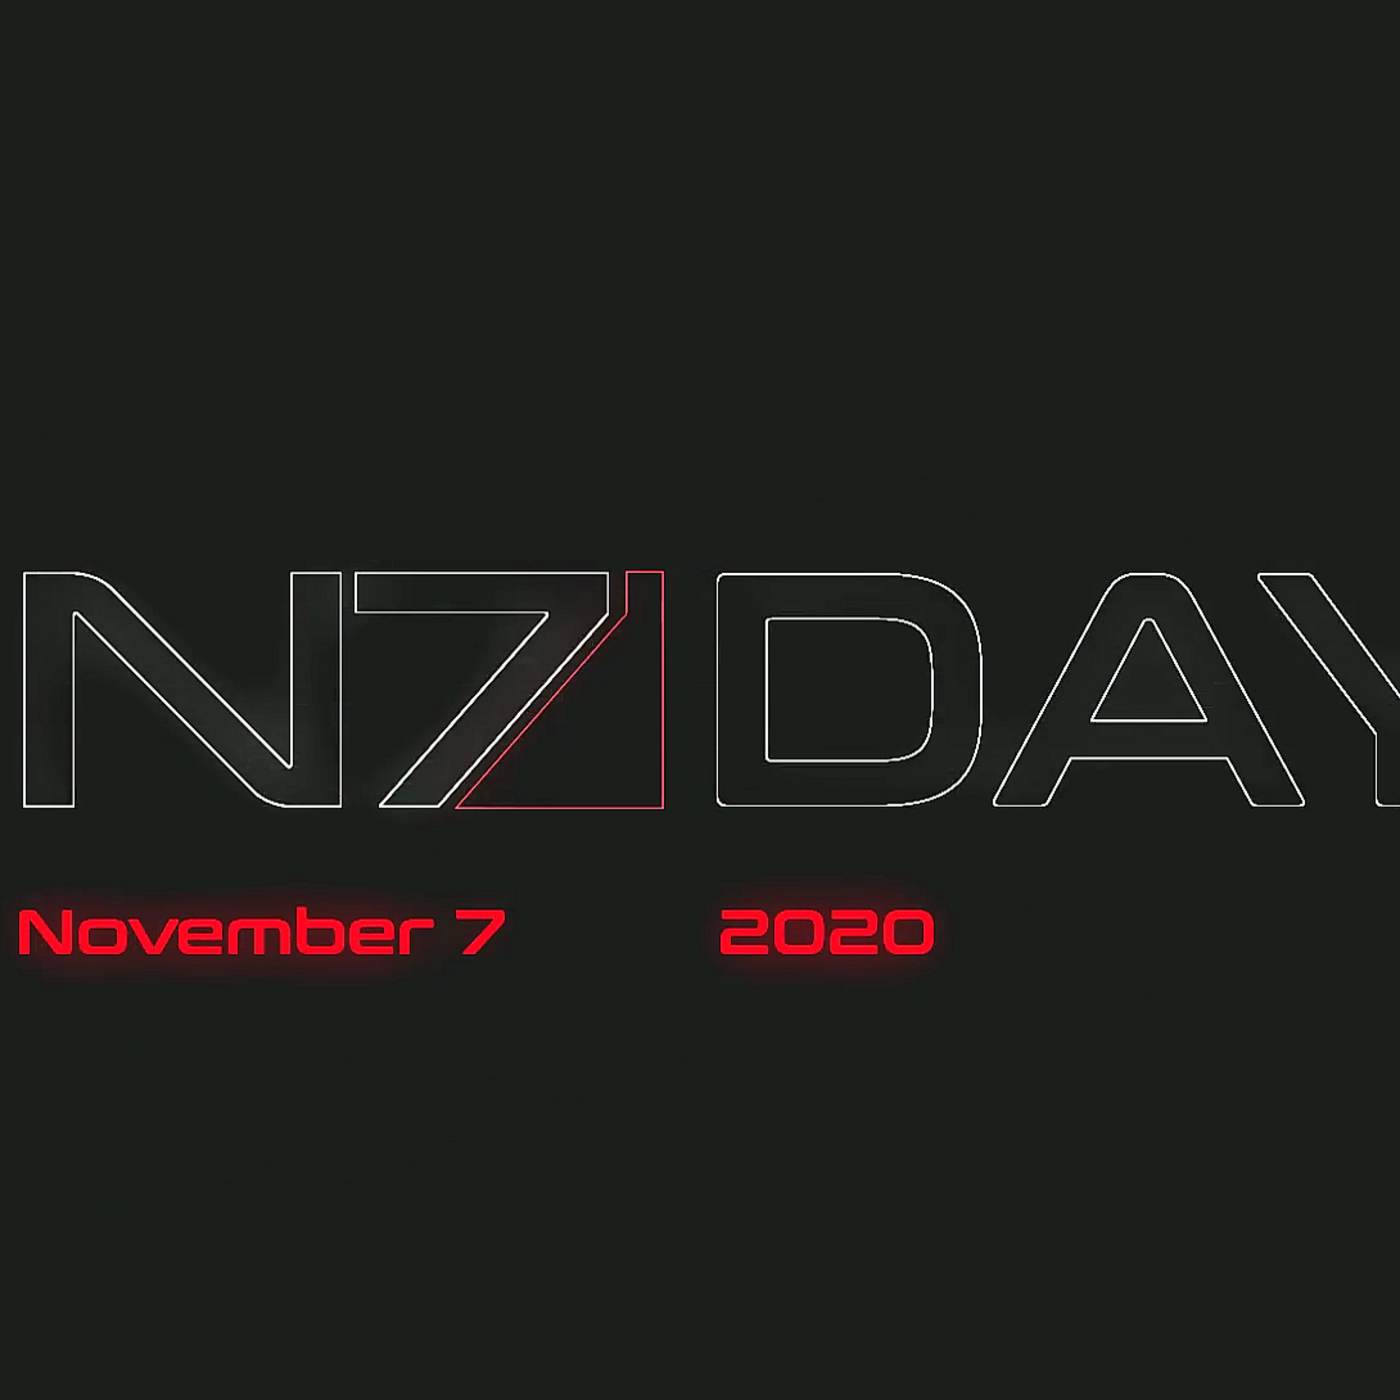 N7 Day 2020